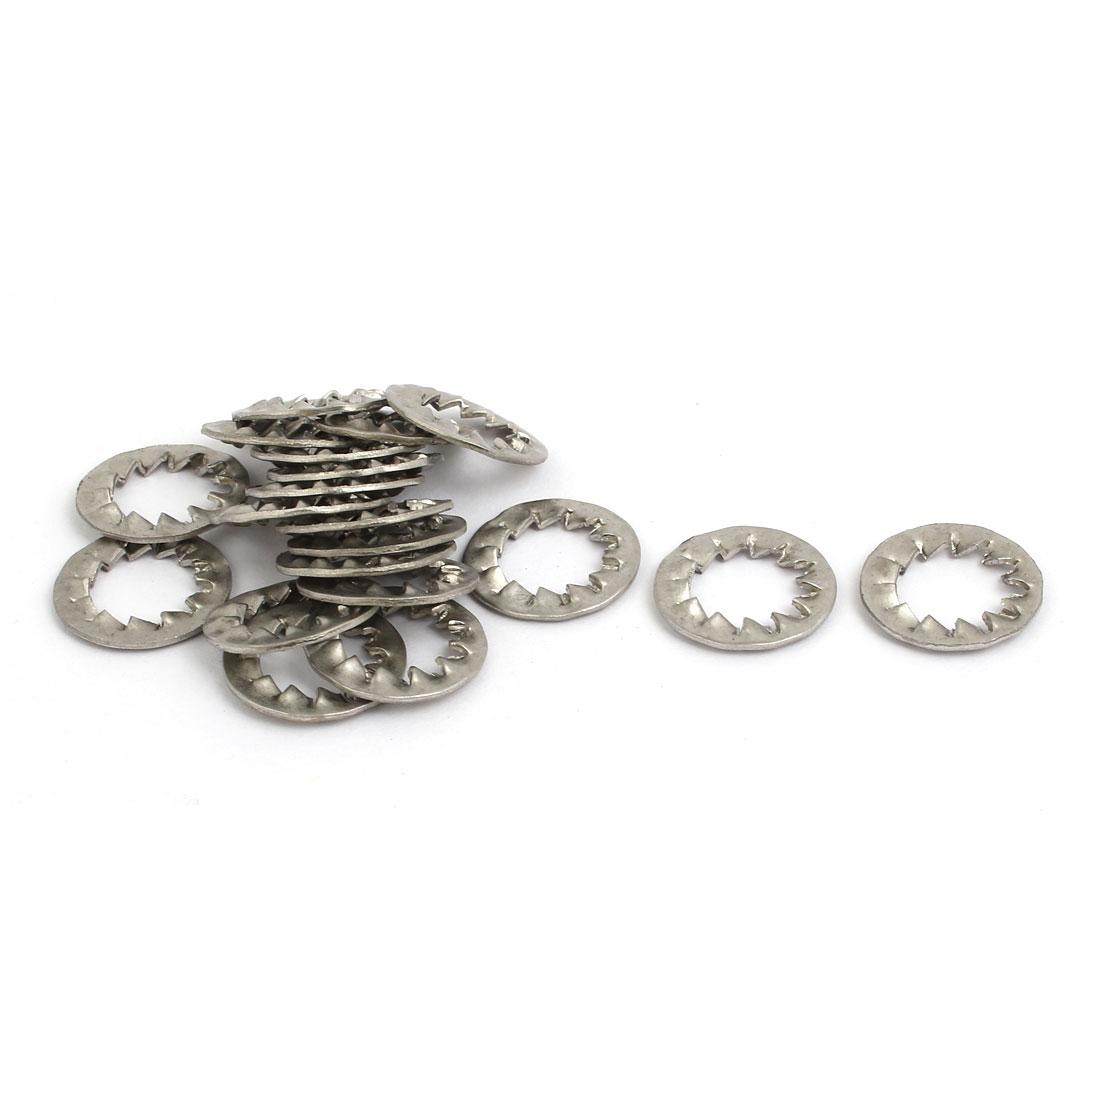 10mm Inner Dia 304 Stainless Steel Internal Serrated Lock Washer Gray 20pcs